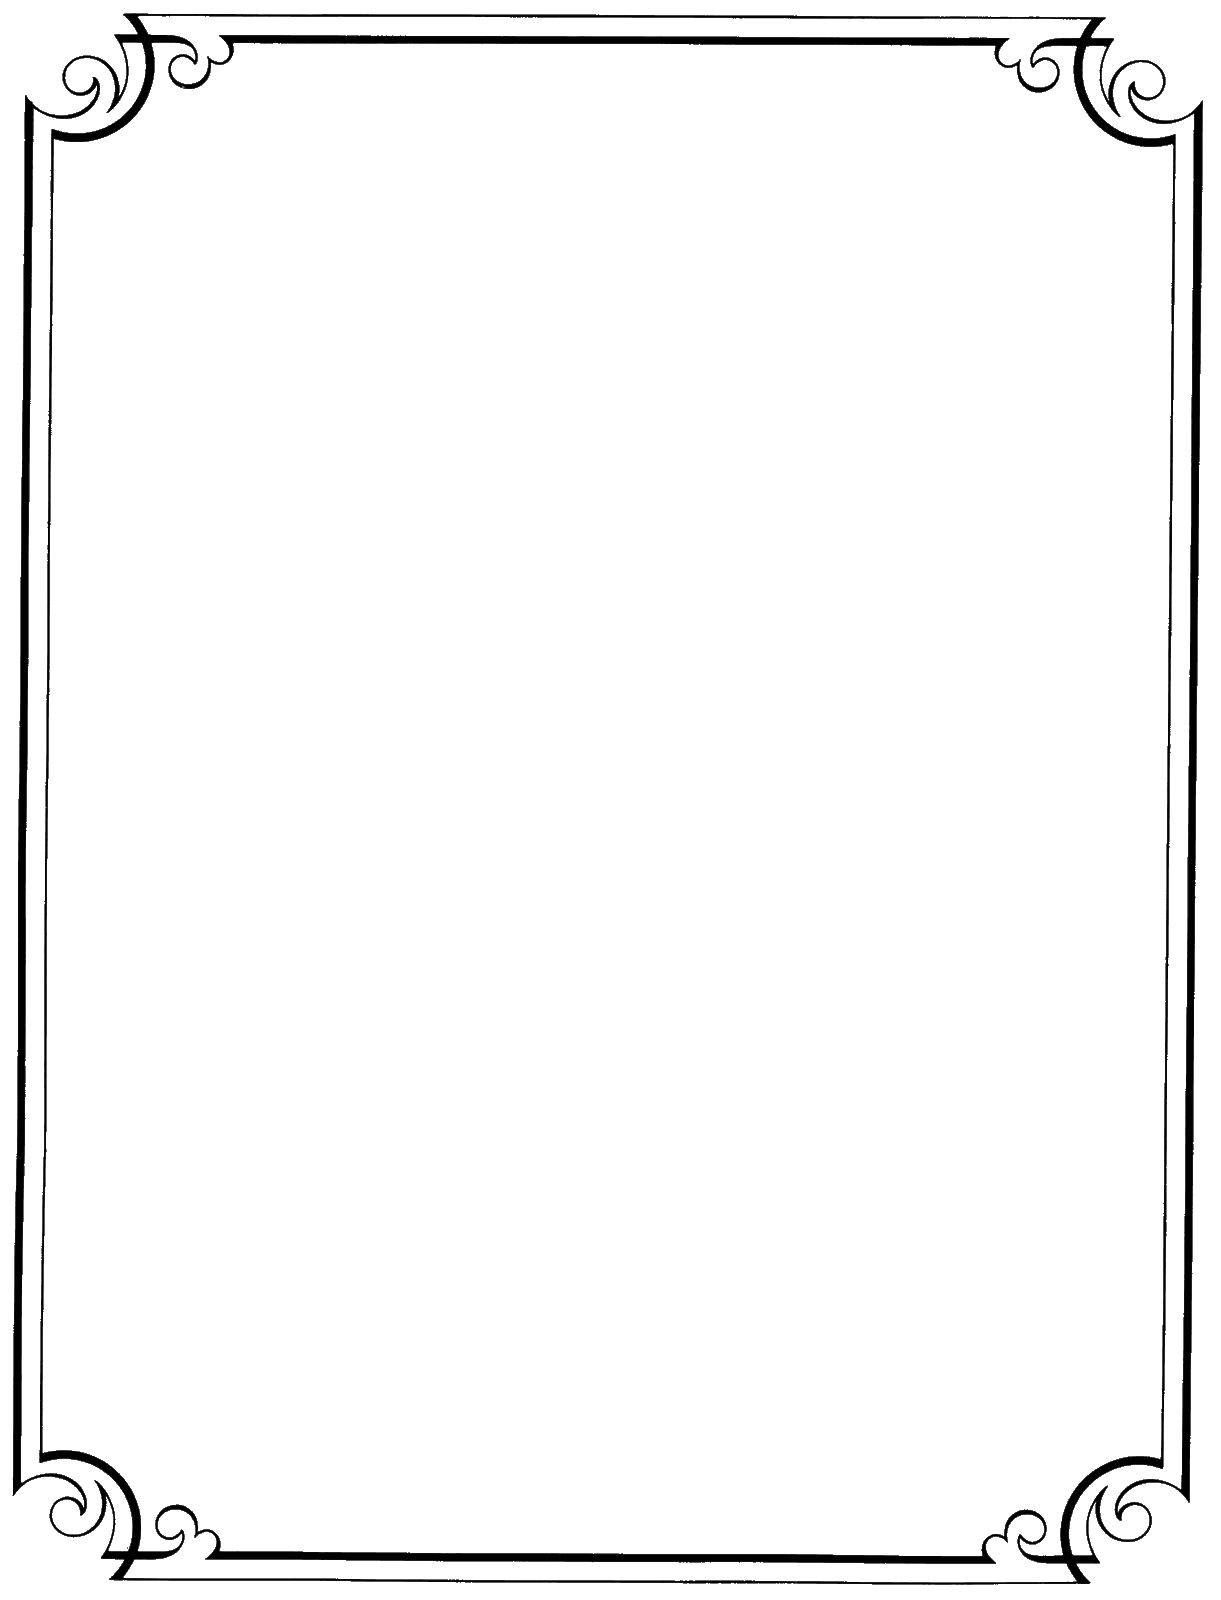 Fancy Page Borders - ClipArt Best - ClipArt Best - Decorative Border PNG